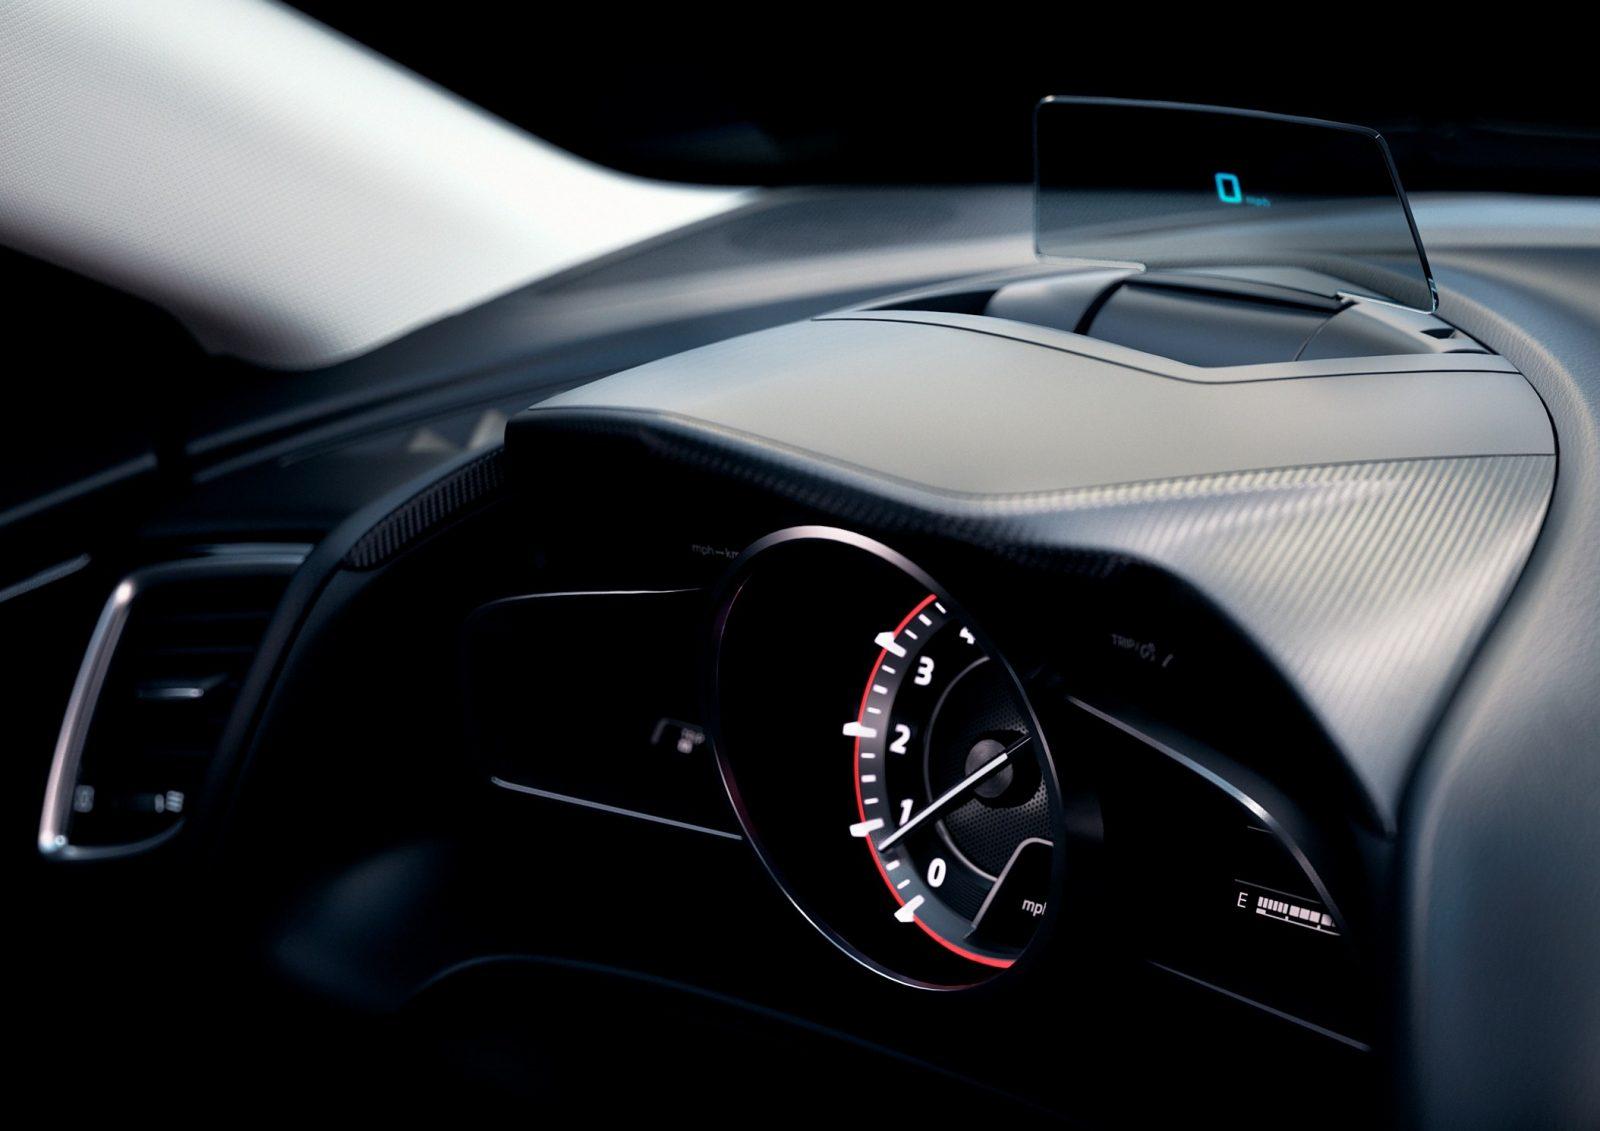 2014 Mazda3 5D interior CGI (12)